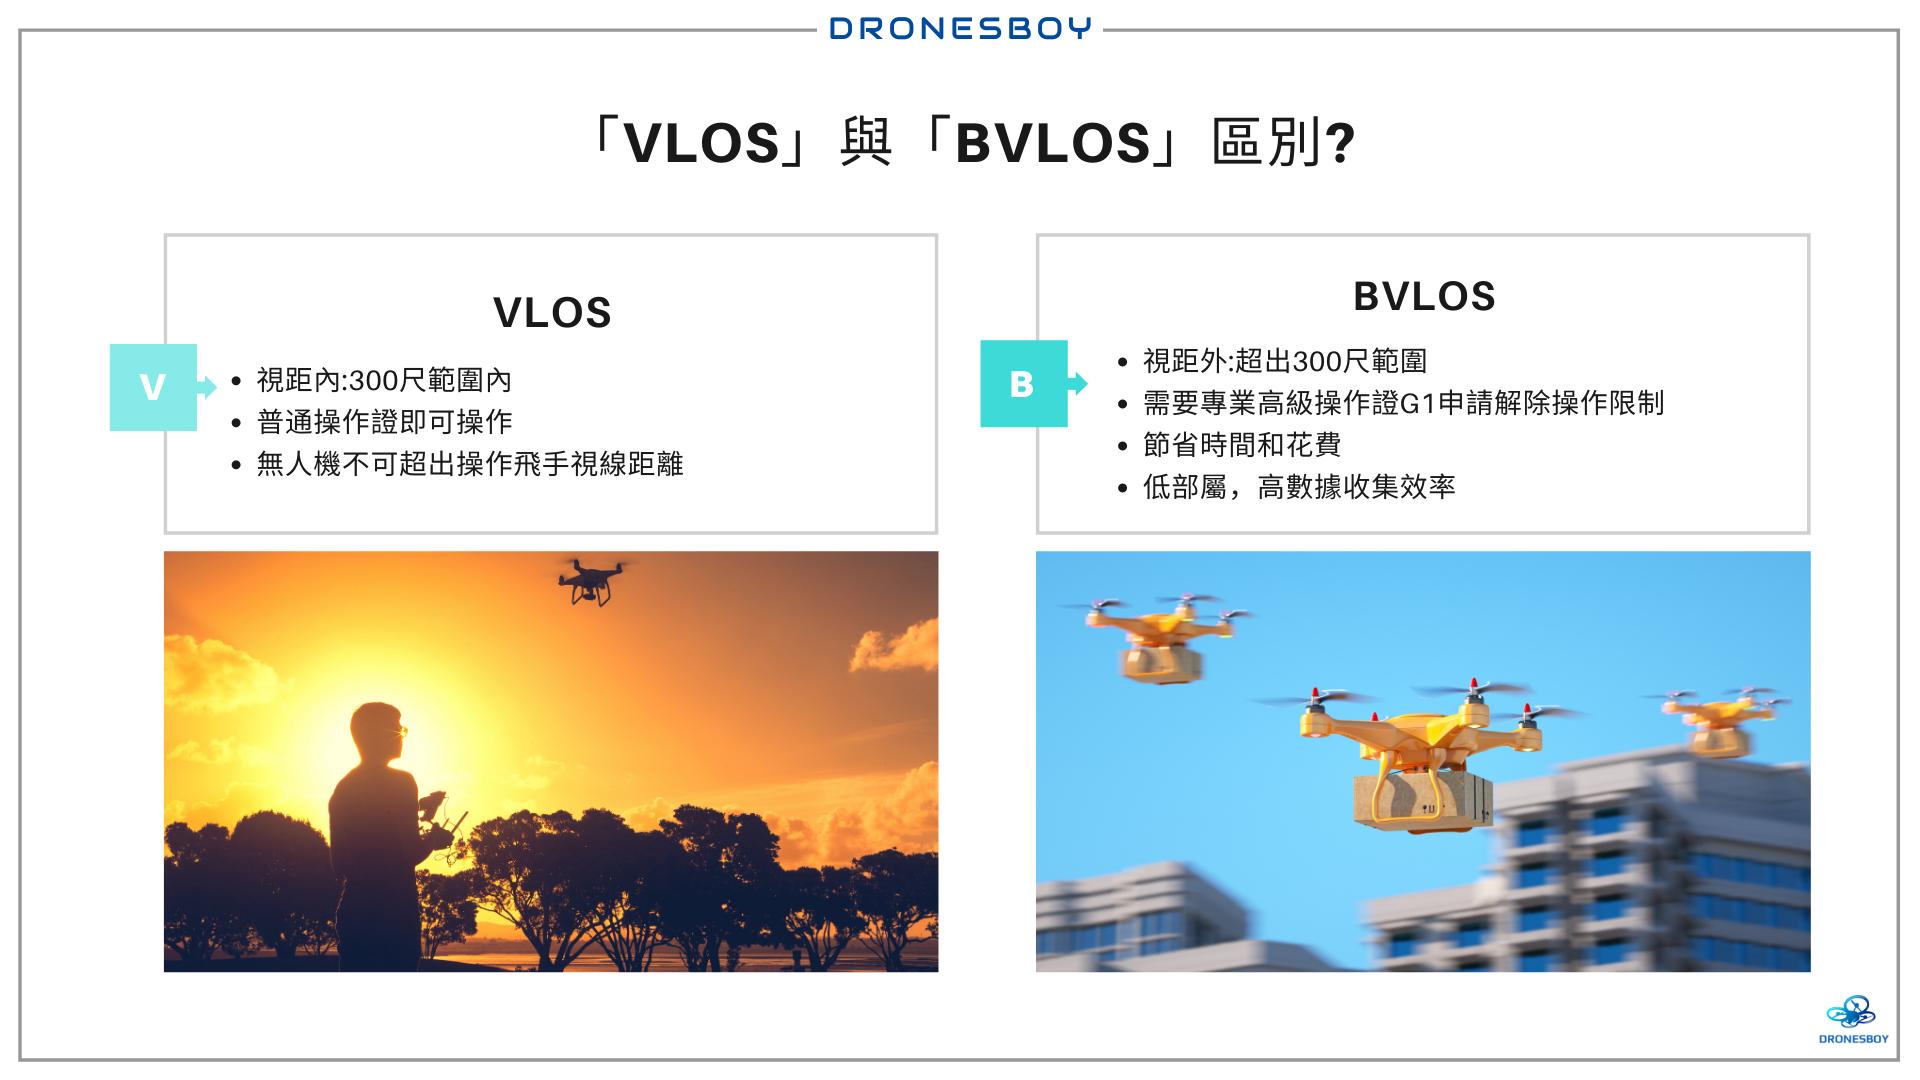 「VLOS」與「BVLOS」是什麼